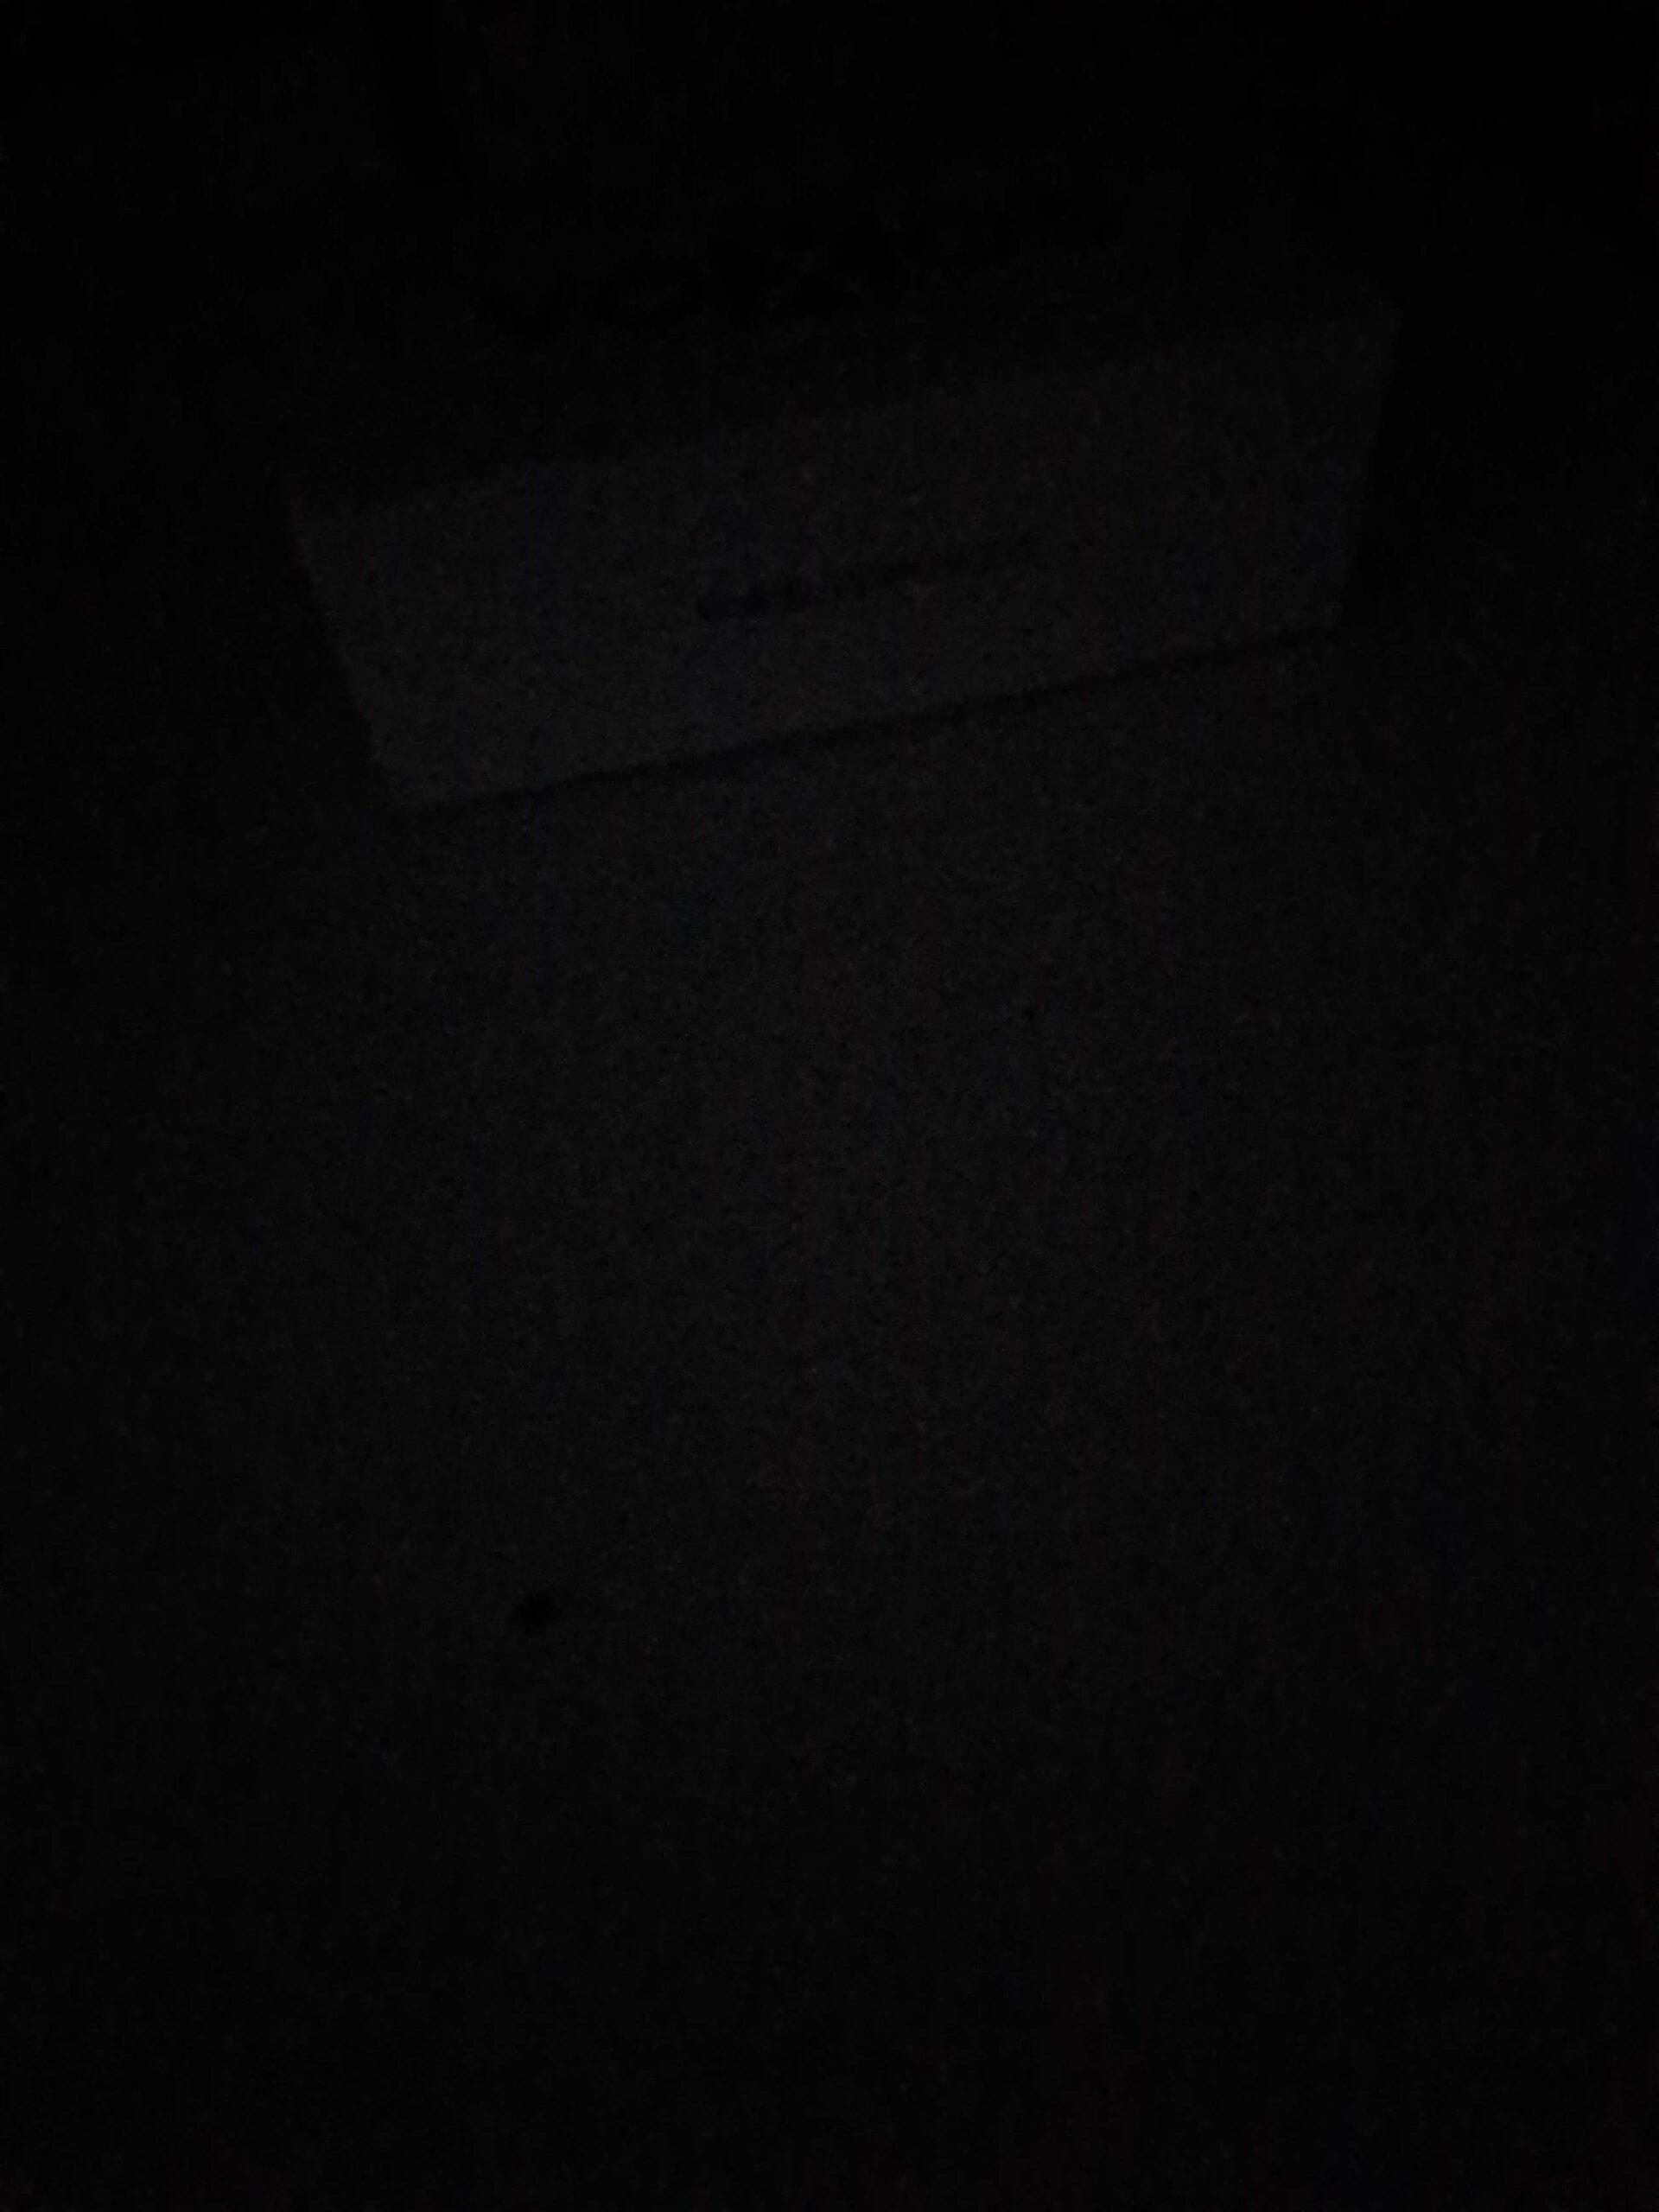 Olight Open Pro Penlight close up - control - no light